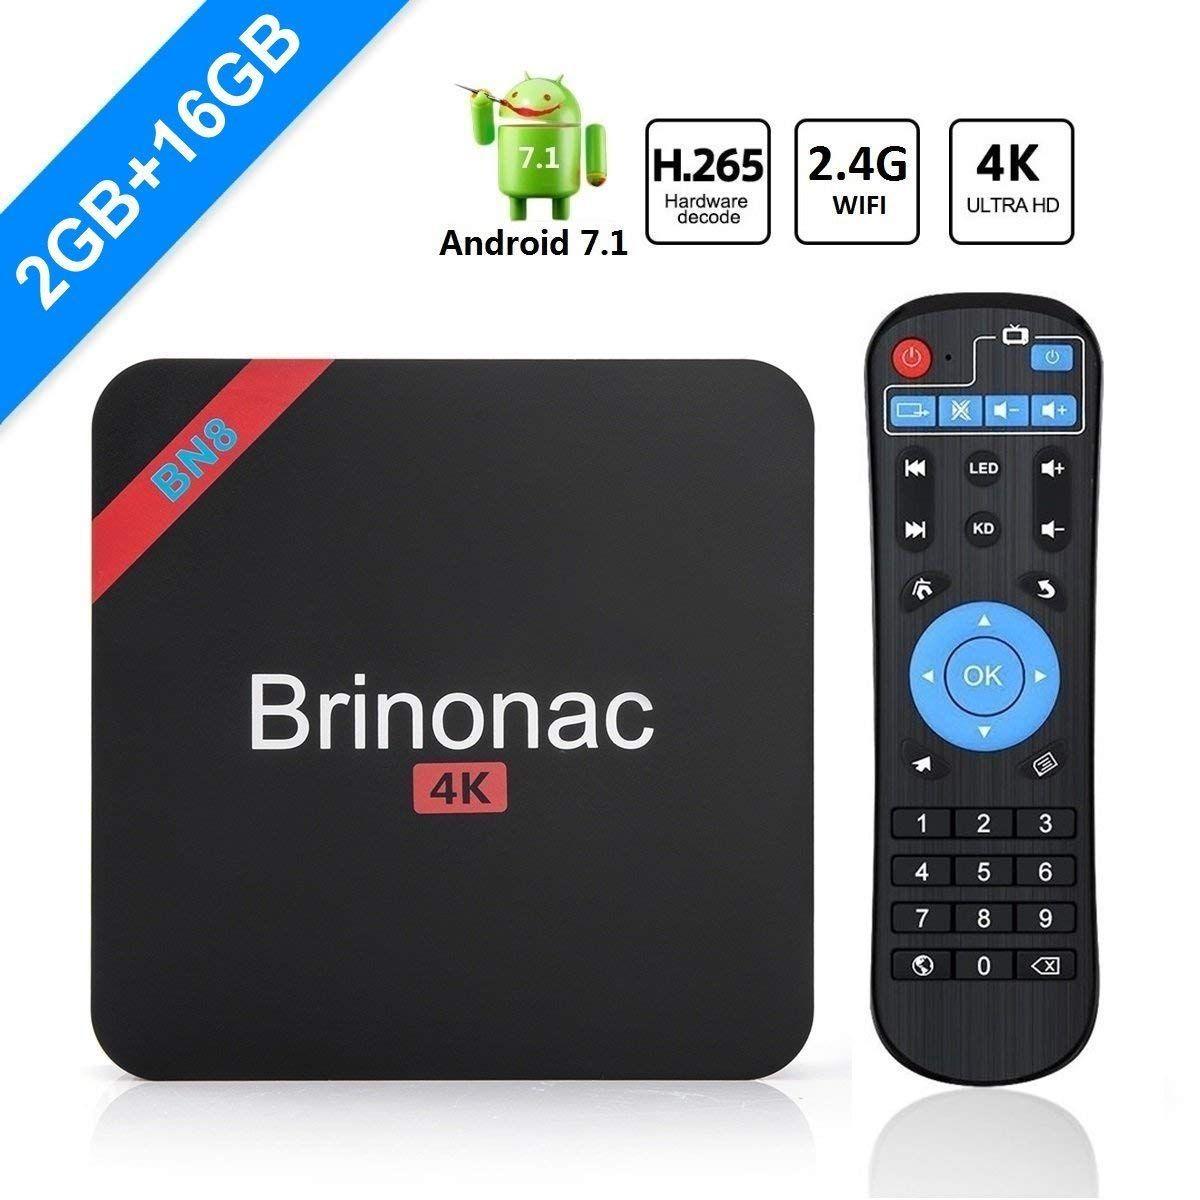 95746d271ba GULEEK BN8 4K HD Smart Android 7.1 TV Box avec Amlogic S905W Quad-core 2 Go  de RAM 16 Go ROM 2.4G Wifi 3D H.265 4K HD Player (2 Go + 16 Go)